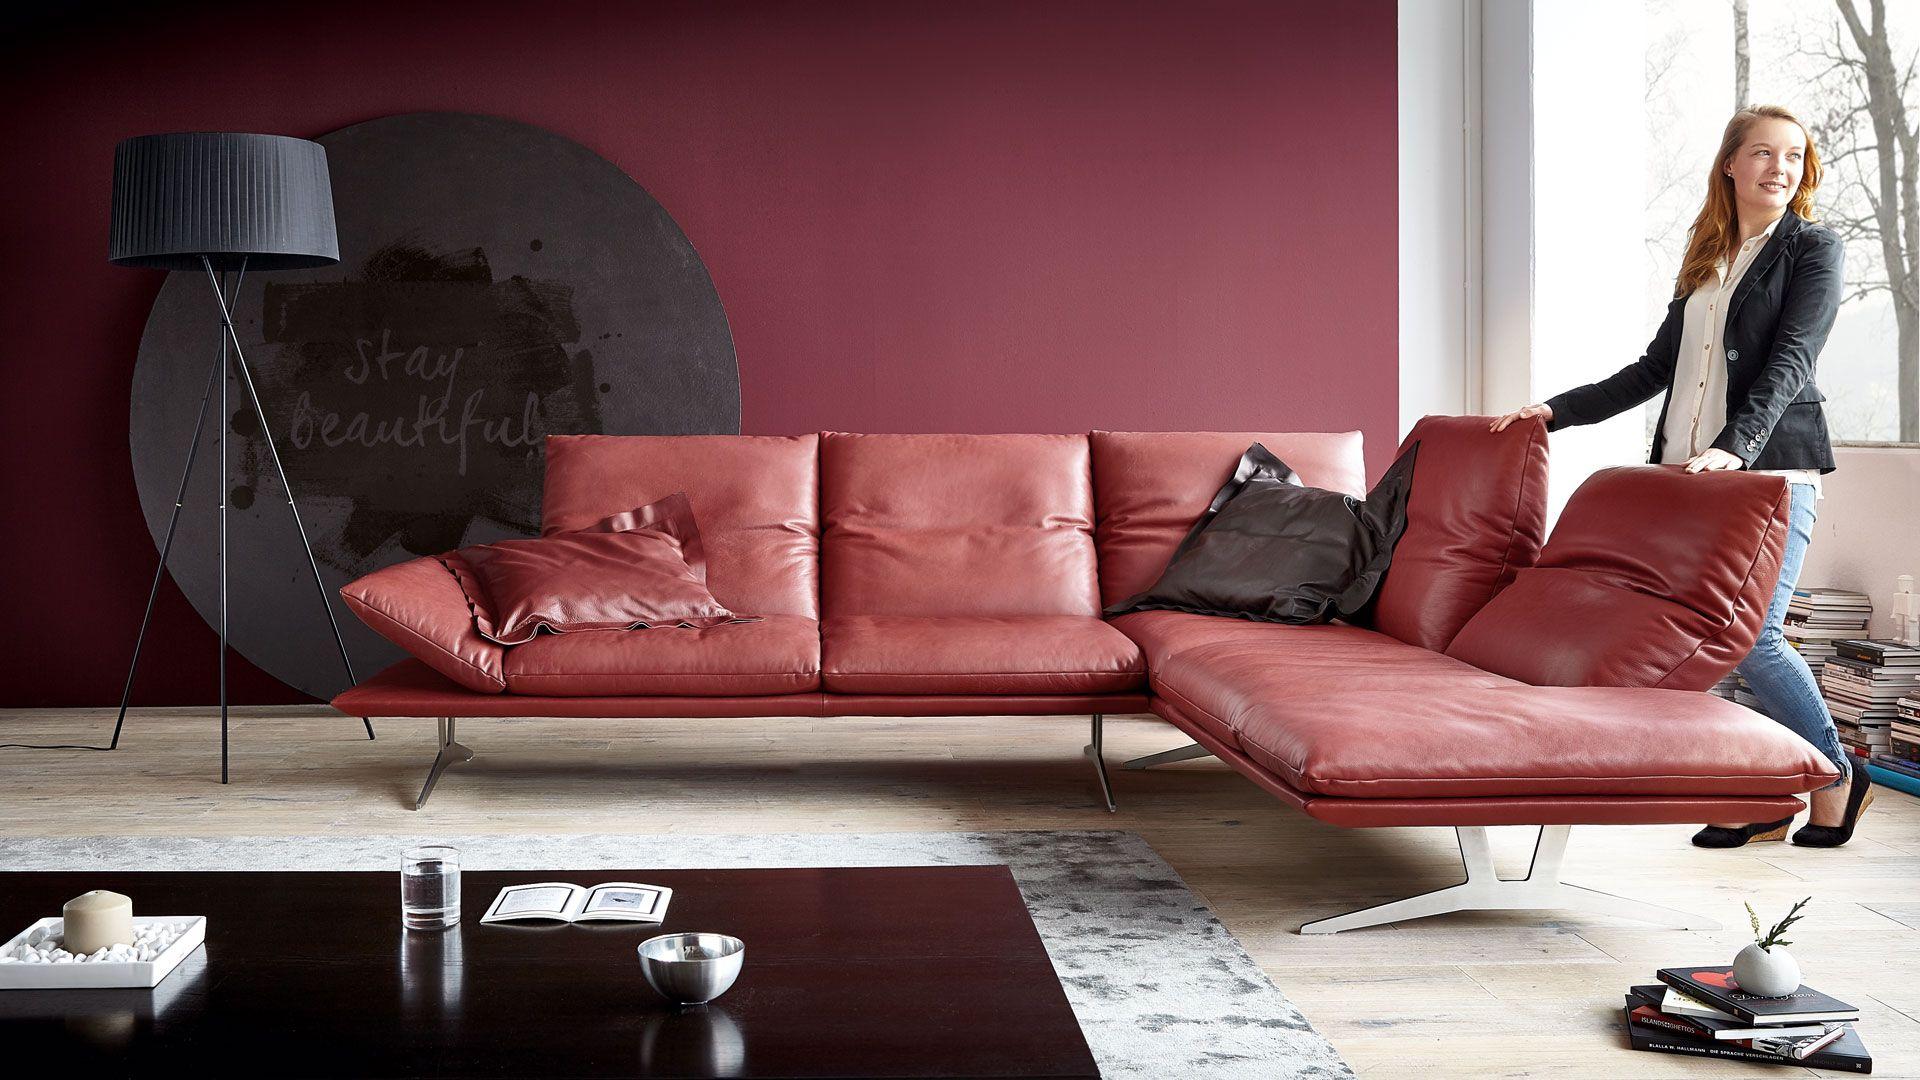 Pin By Yosra Khalid On Furniture In 2020 Best Sofa Sofa Design Furniture